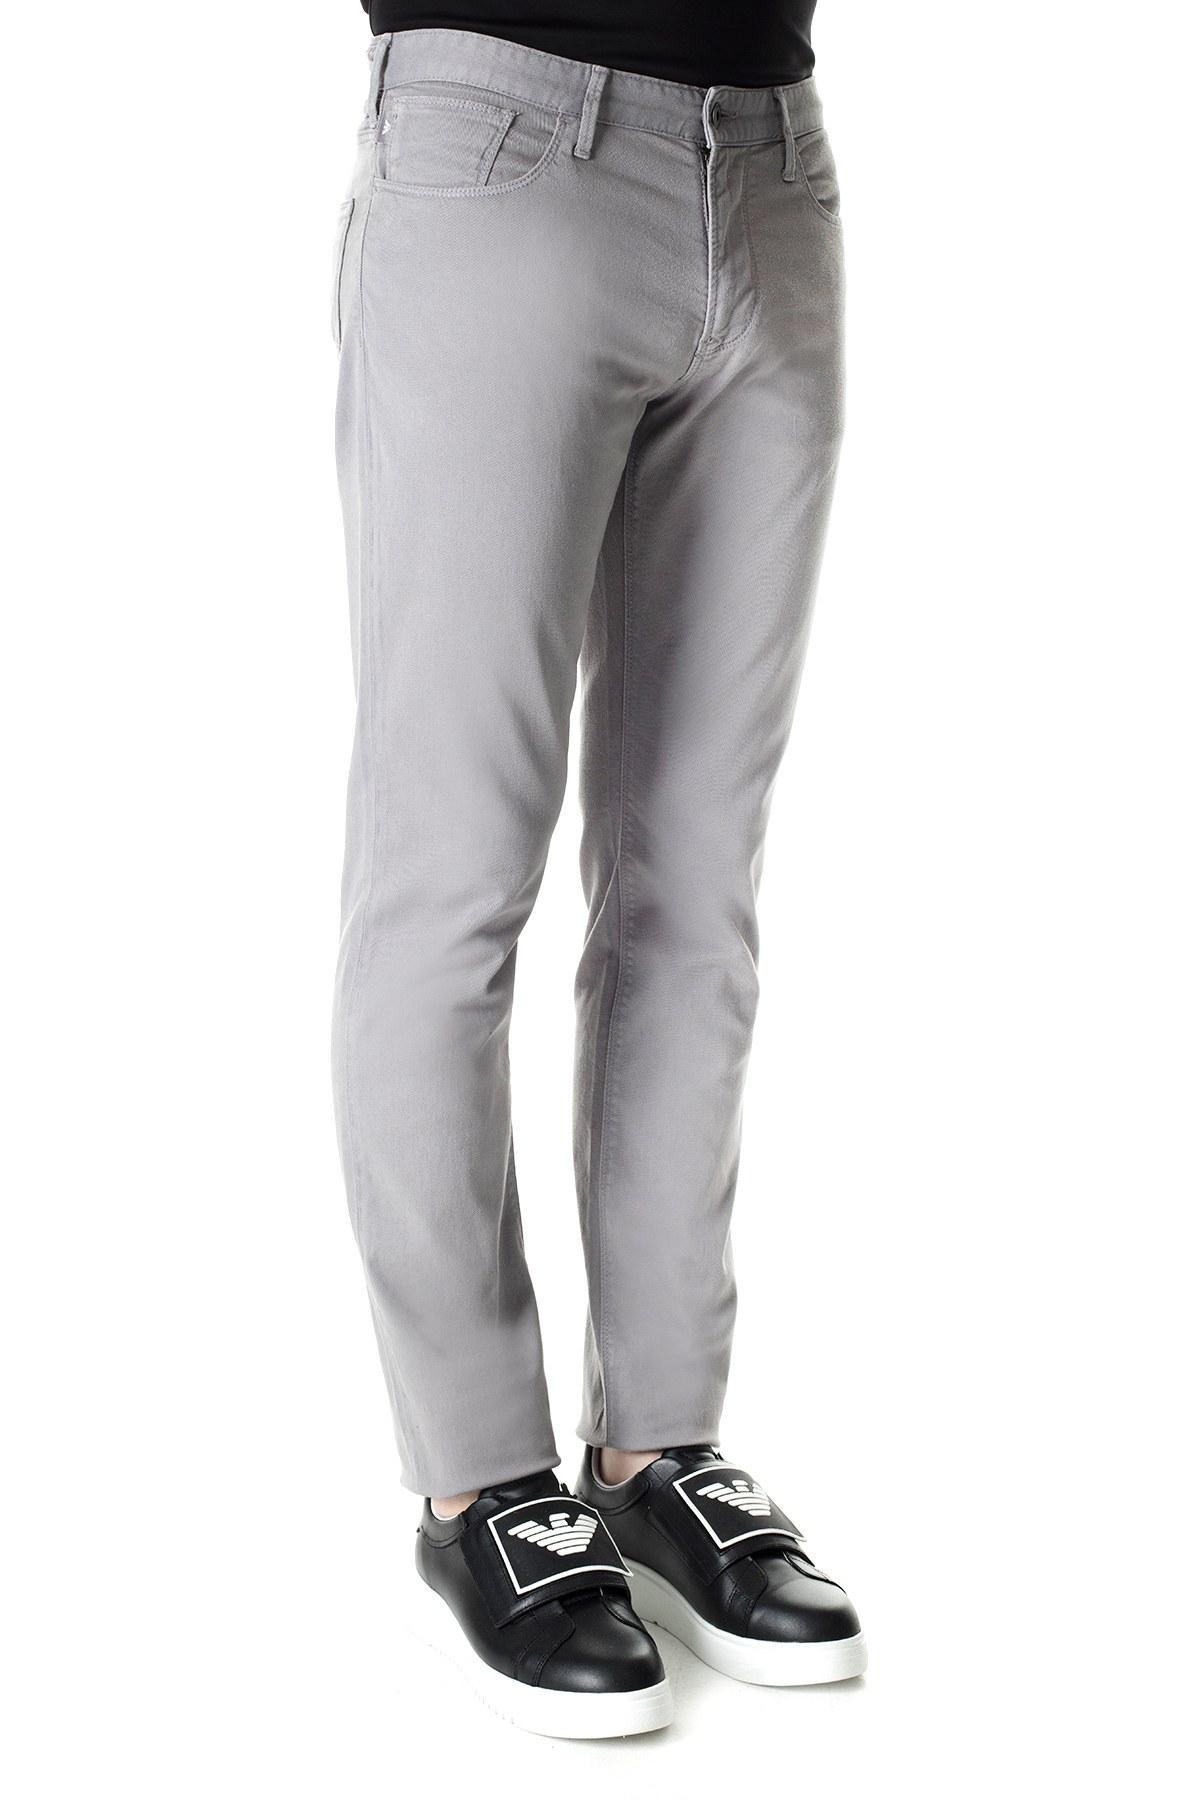 Emporio Armani J06 Jeans Erkek Pamuklu Pantolon 3H1J06 1N4ZZ 0653 GRİ